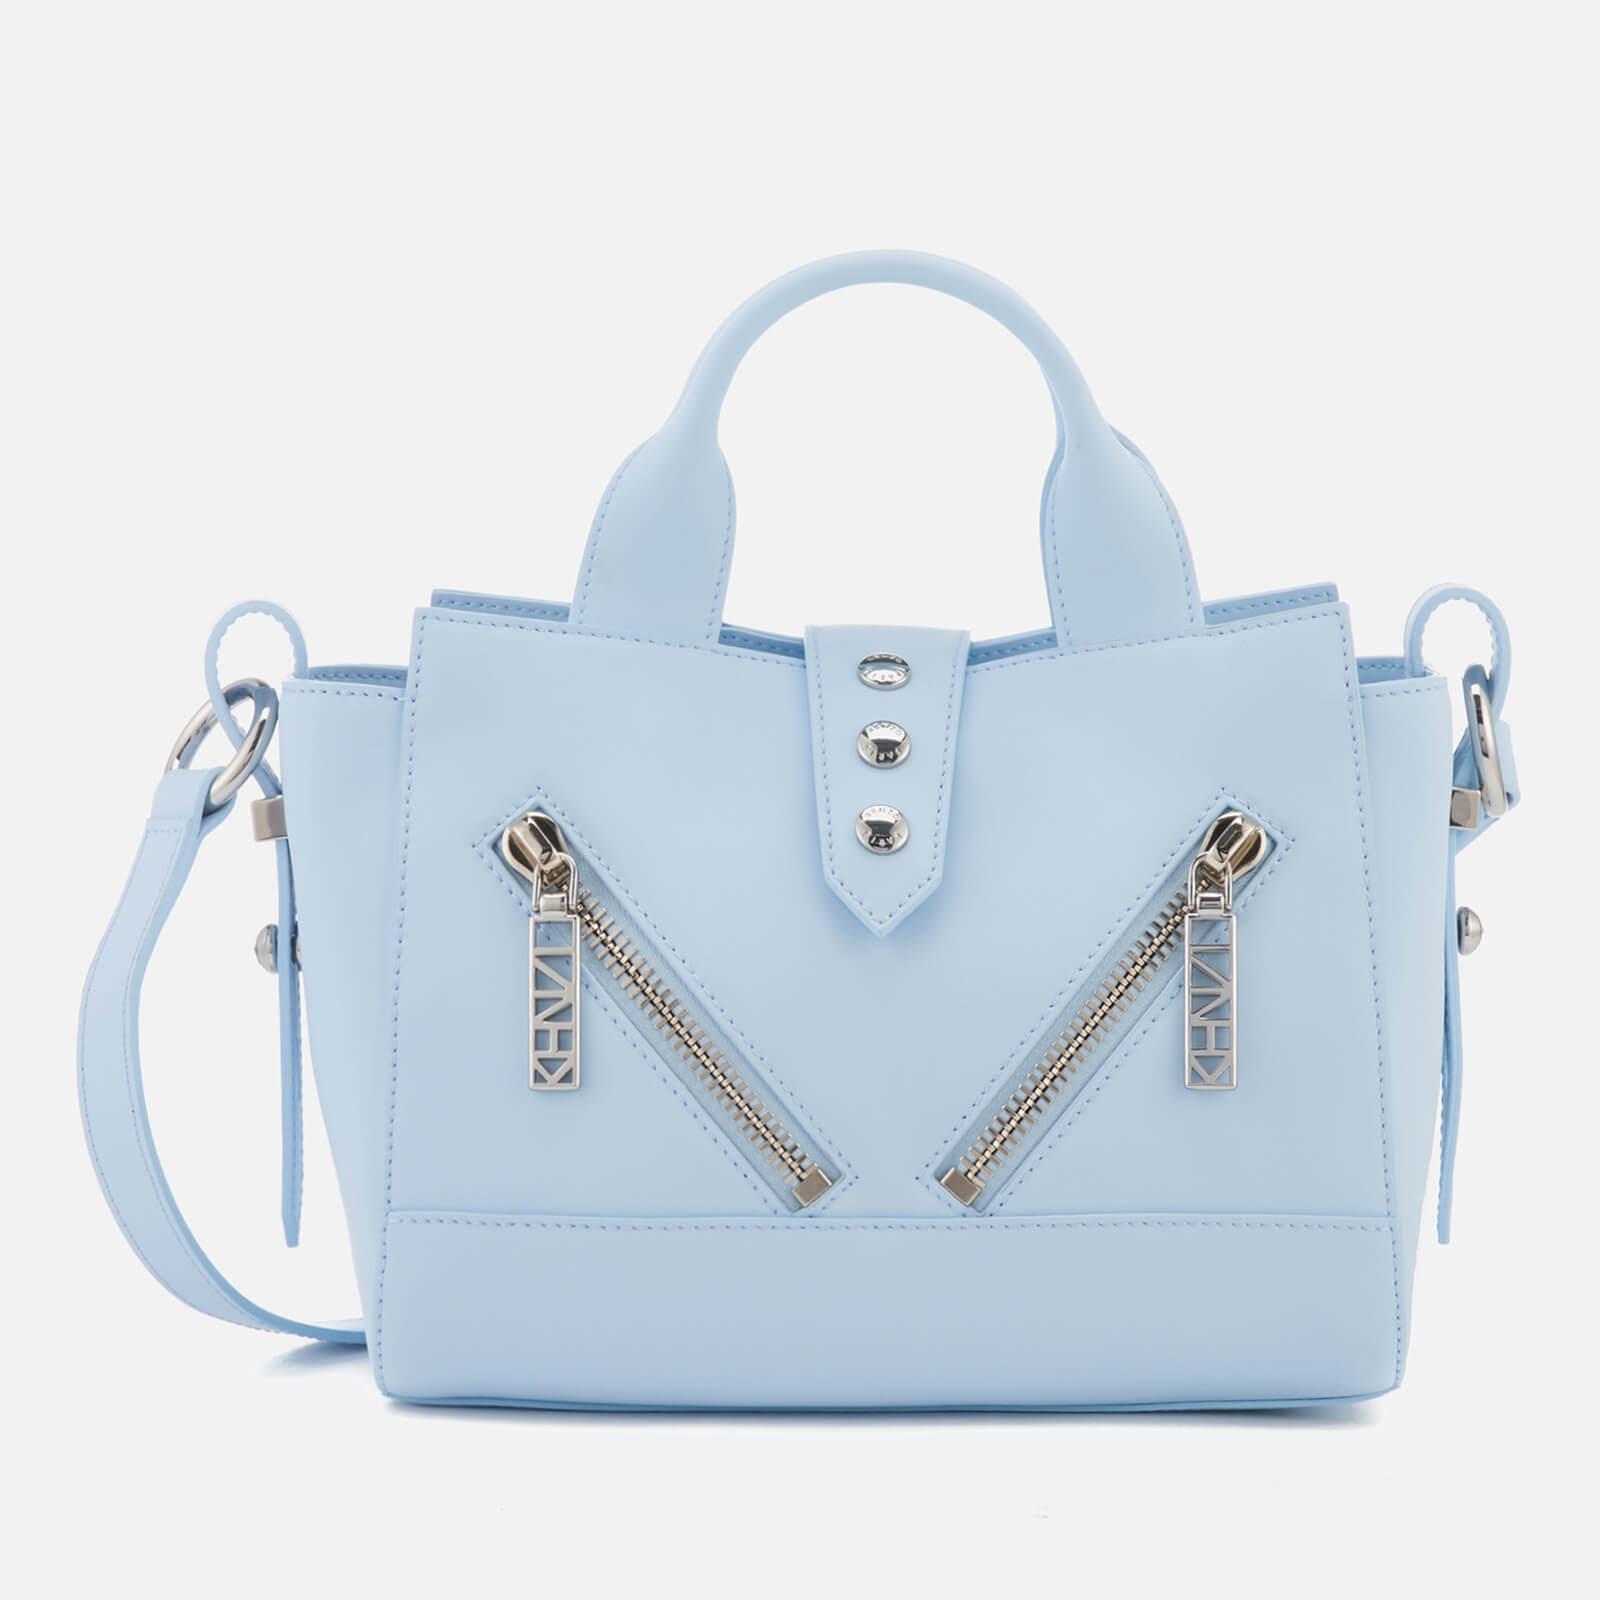 b2163ae8 KENZO Women's Kalifornia Mini Tote Bag - Sky Blue - Free UK Delivery over  £50